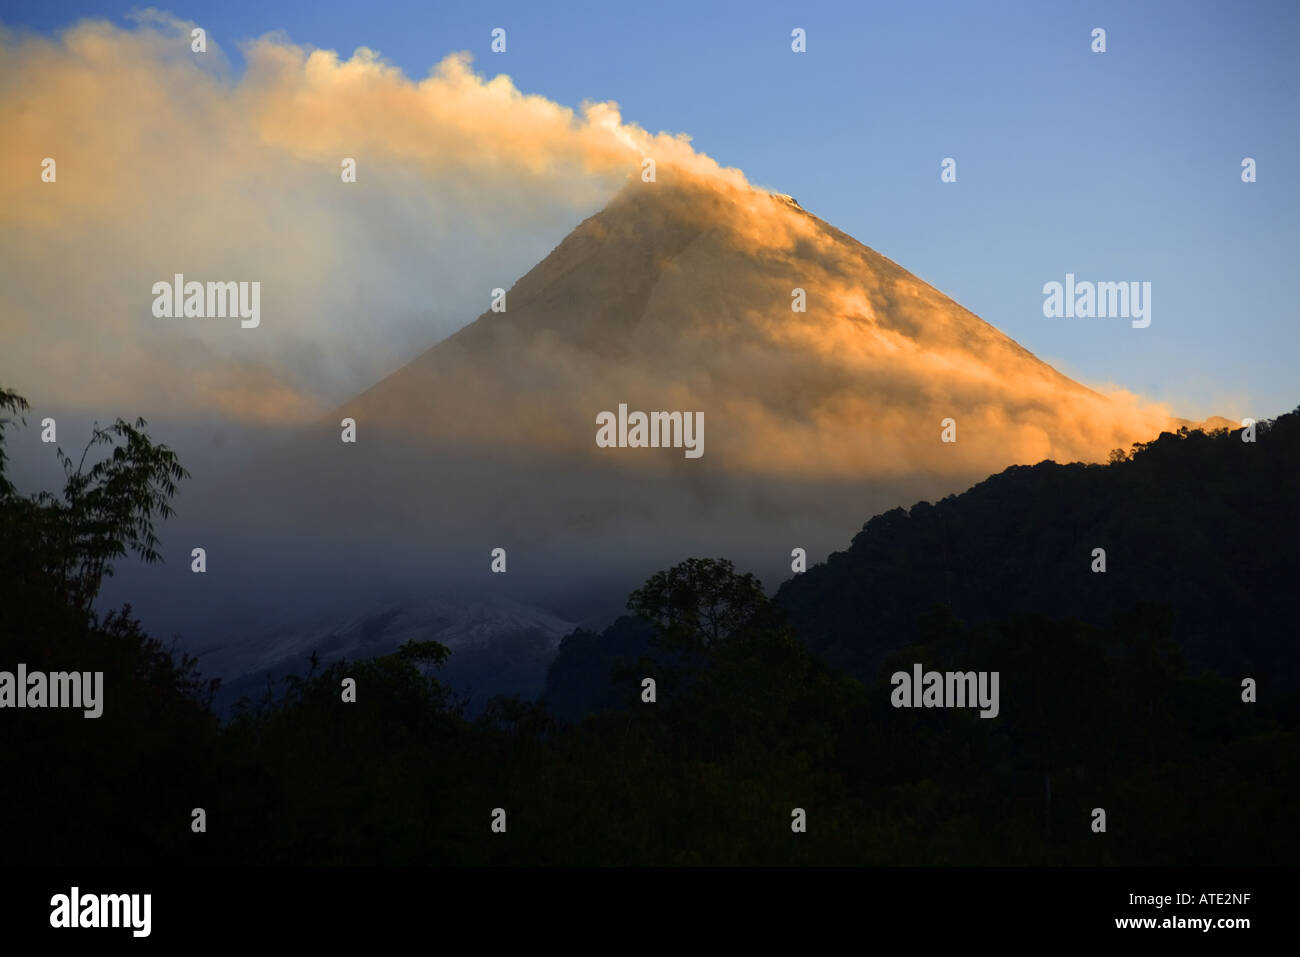 Mt. Merapi, Central Java, Indonesia emitting smoke and ash - Stock Image